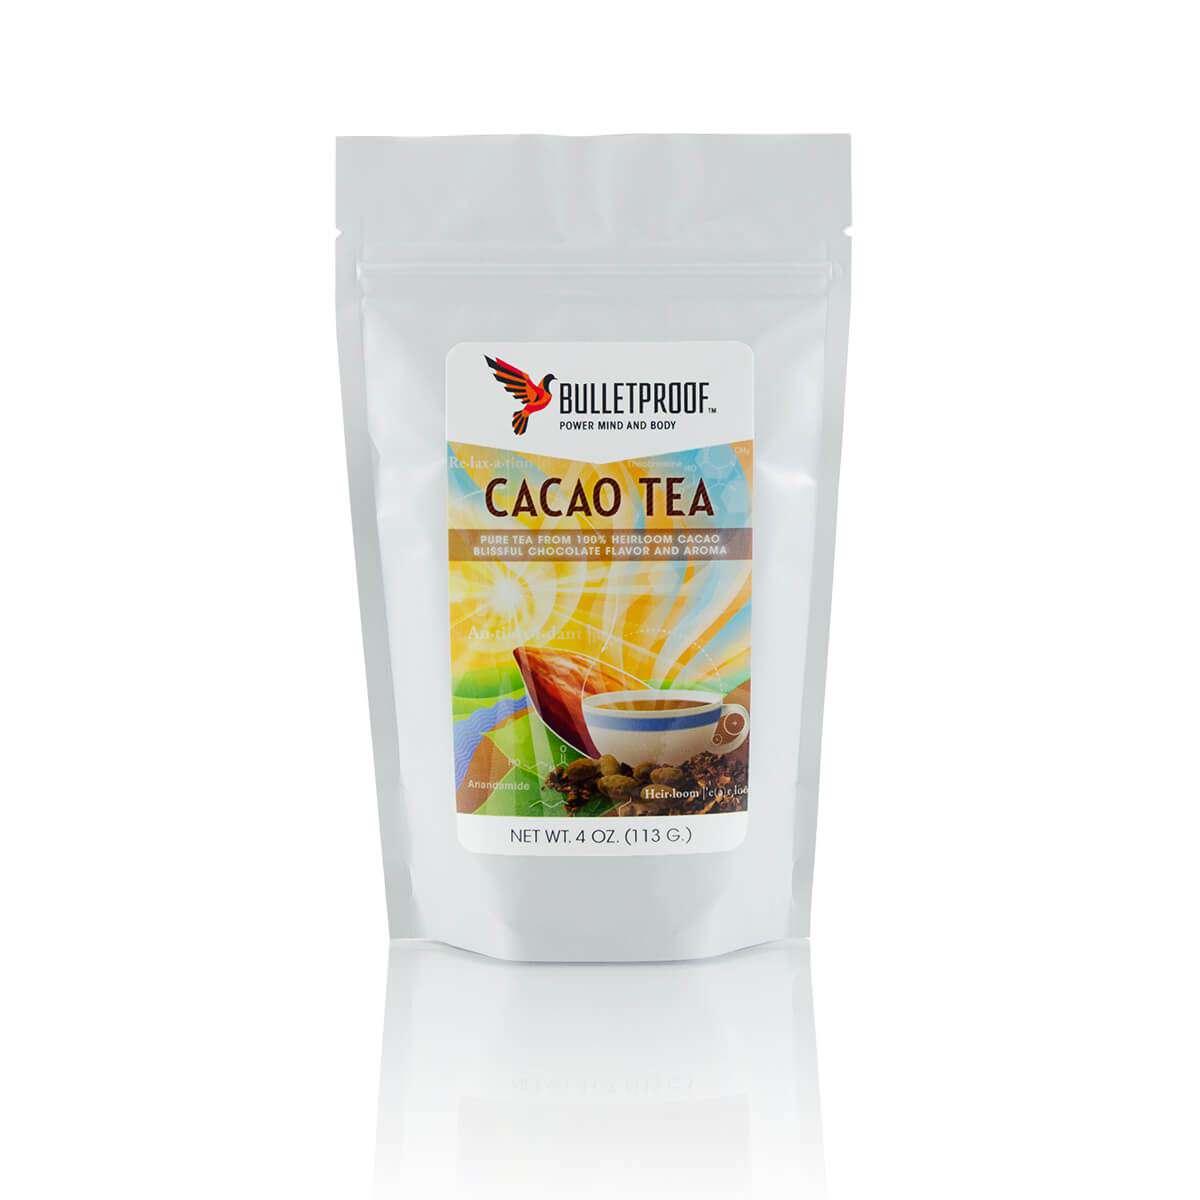 Bulletproof Cacao Tea